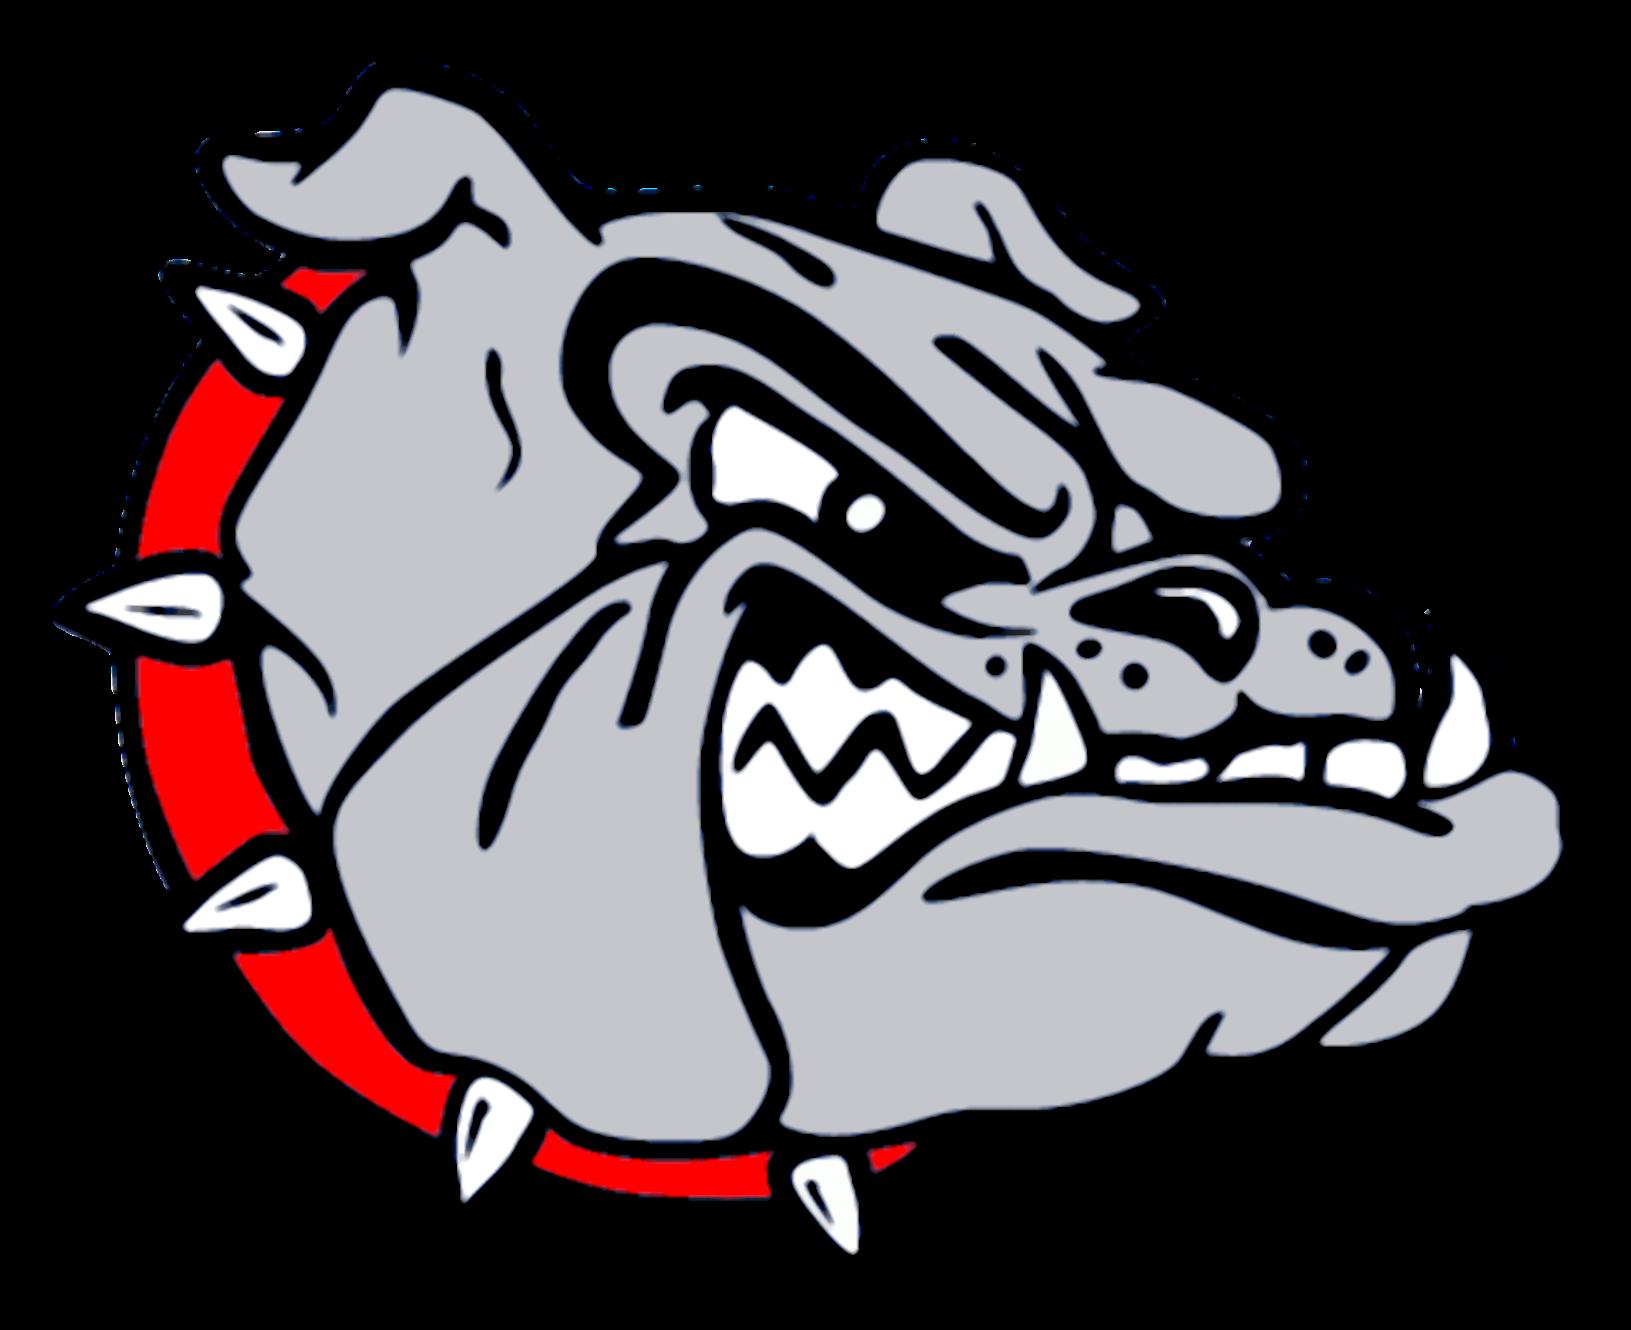 Bulldog Logos Clip Art N3 free image.